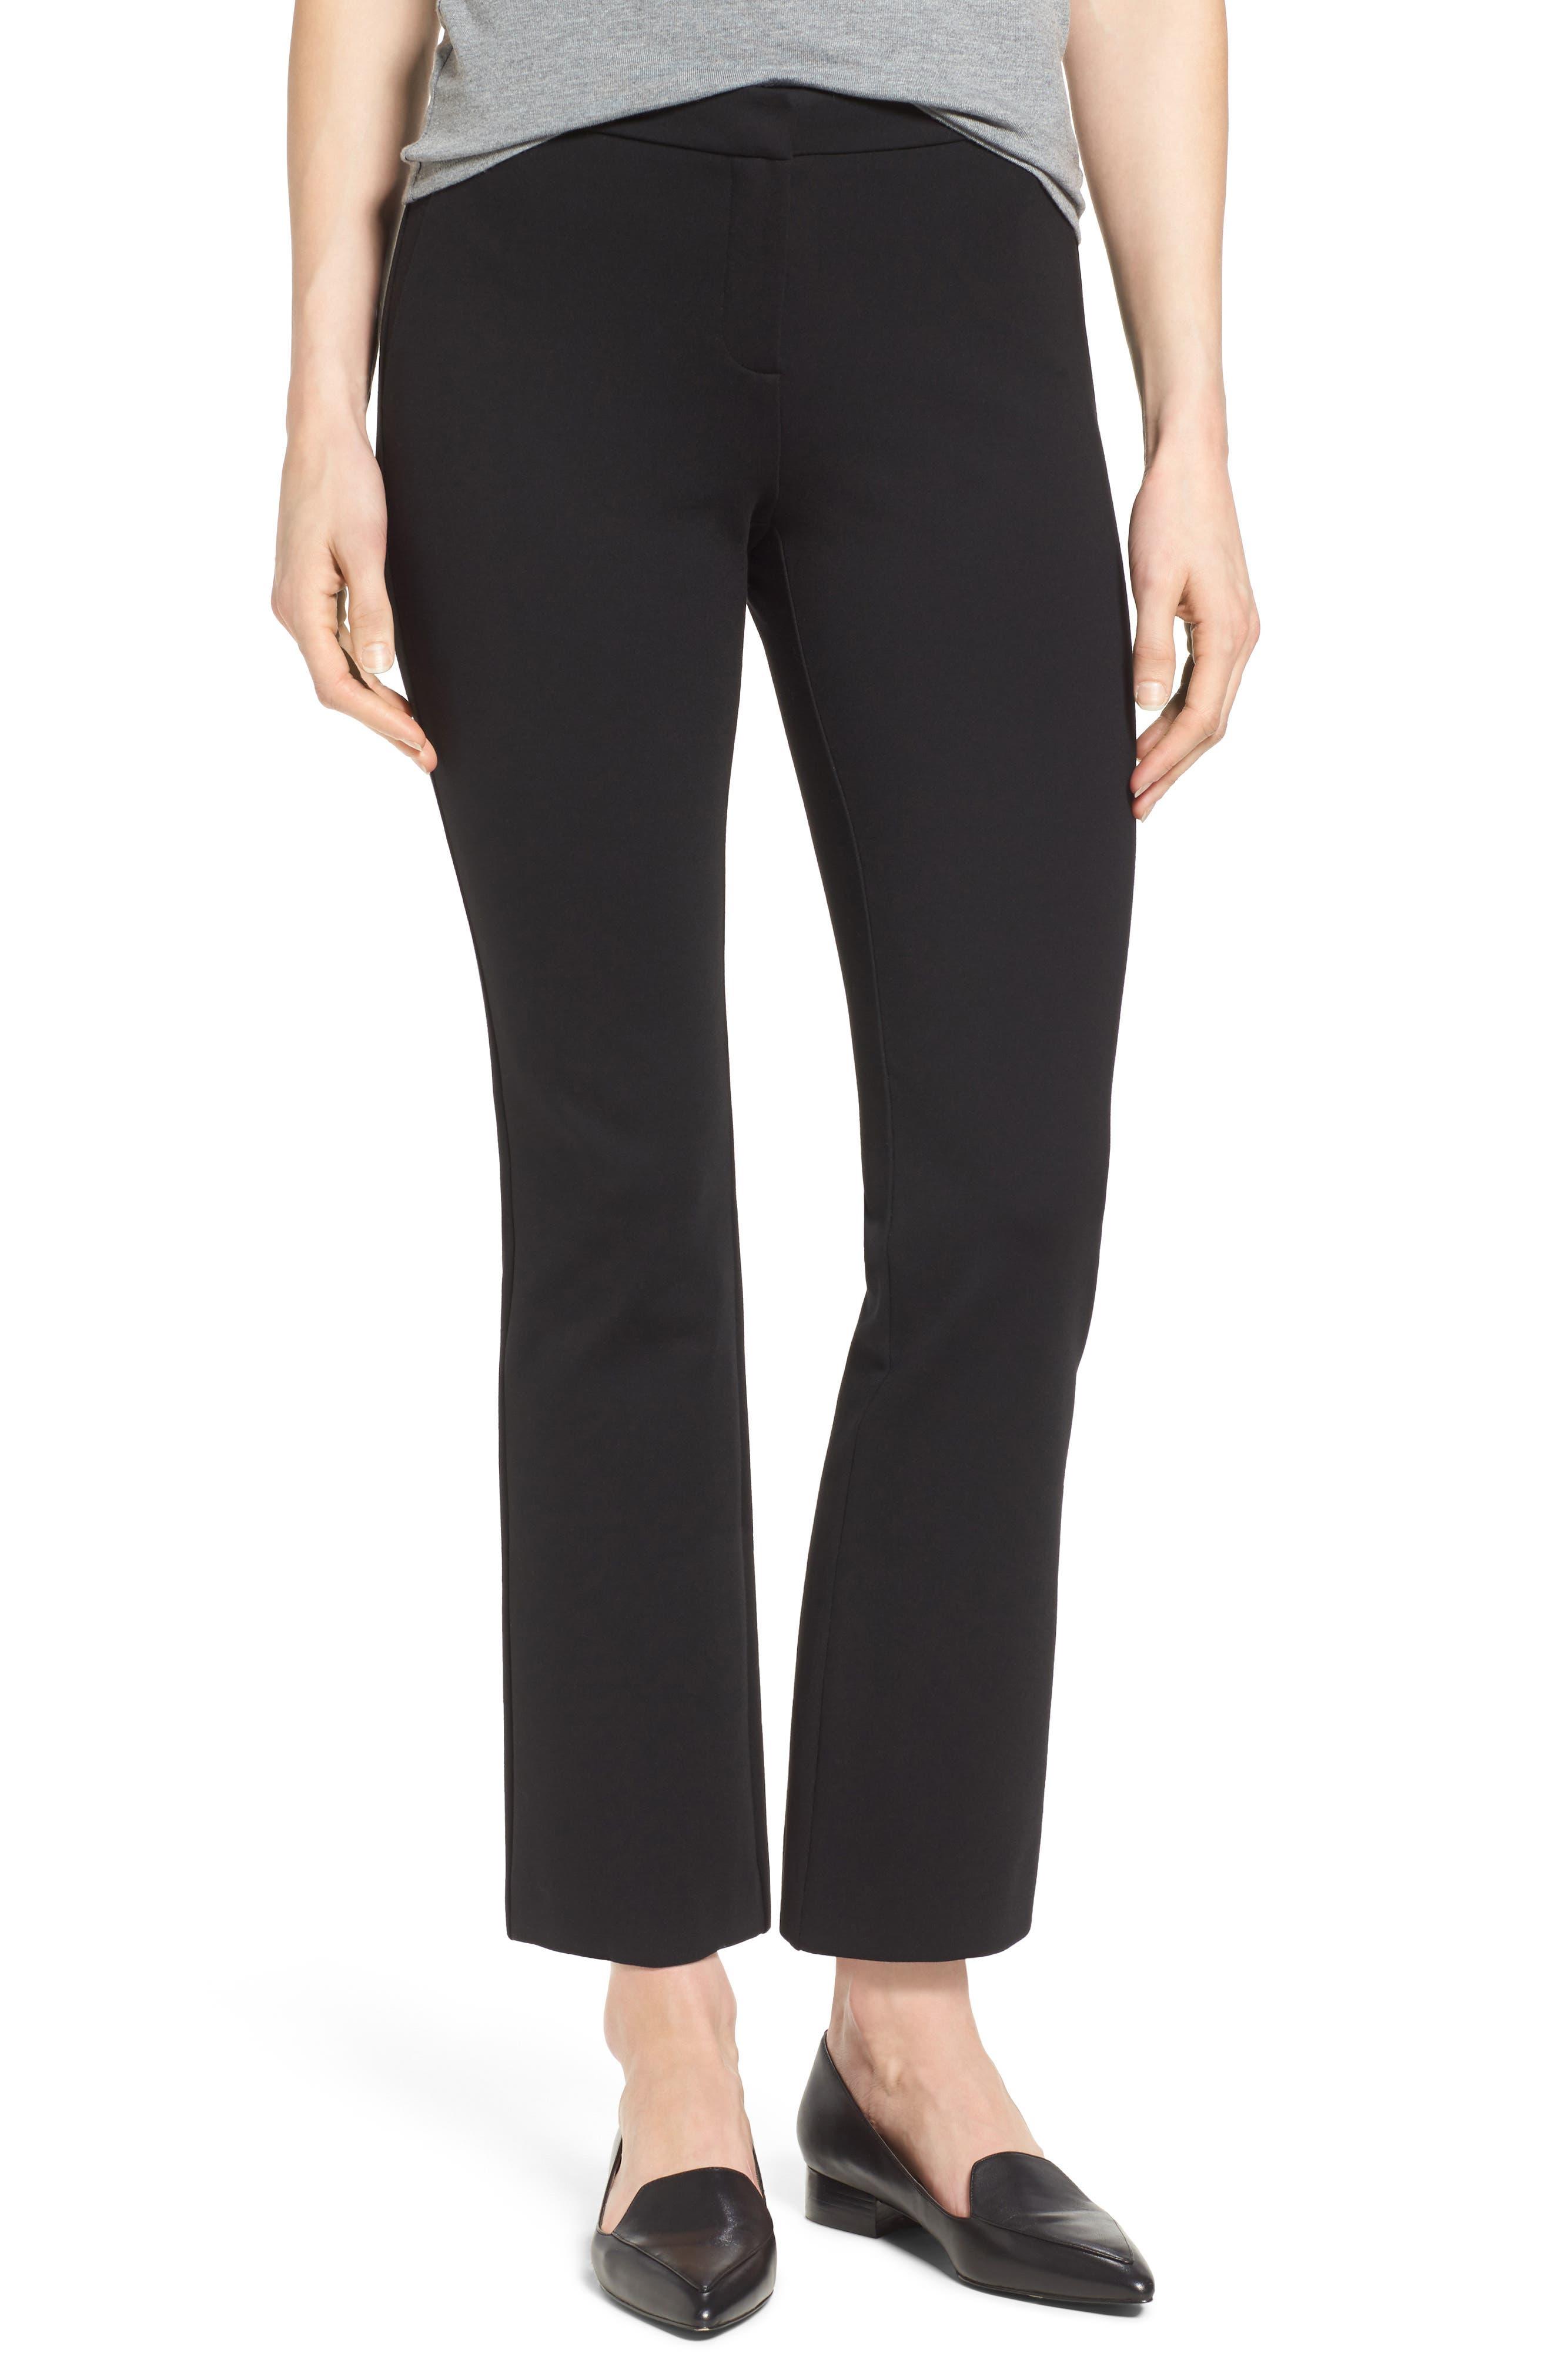 Alternate Image 1 Selected - Halogen® Kick Flare Knit Ankle Pants (Regular & Petite)